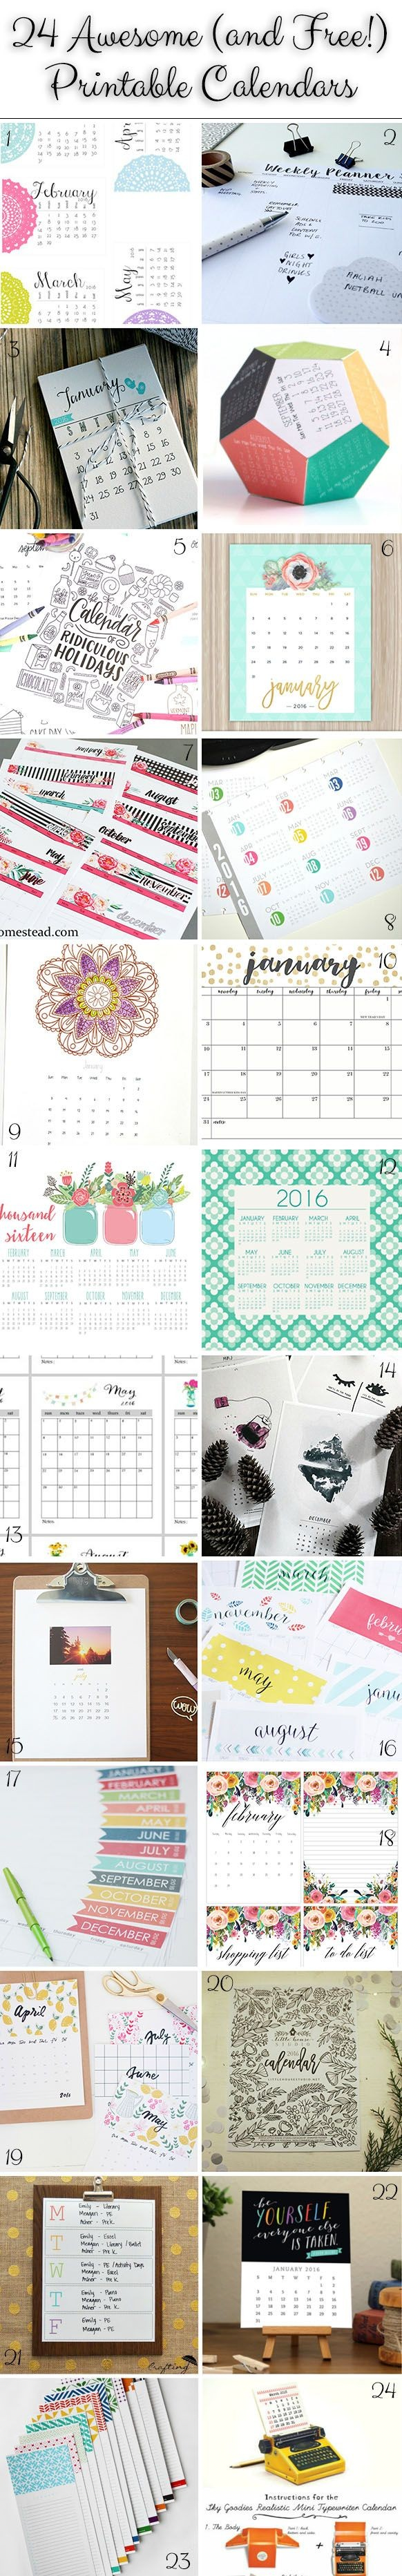 January Pinspiration Pretty Printable Calendars